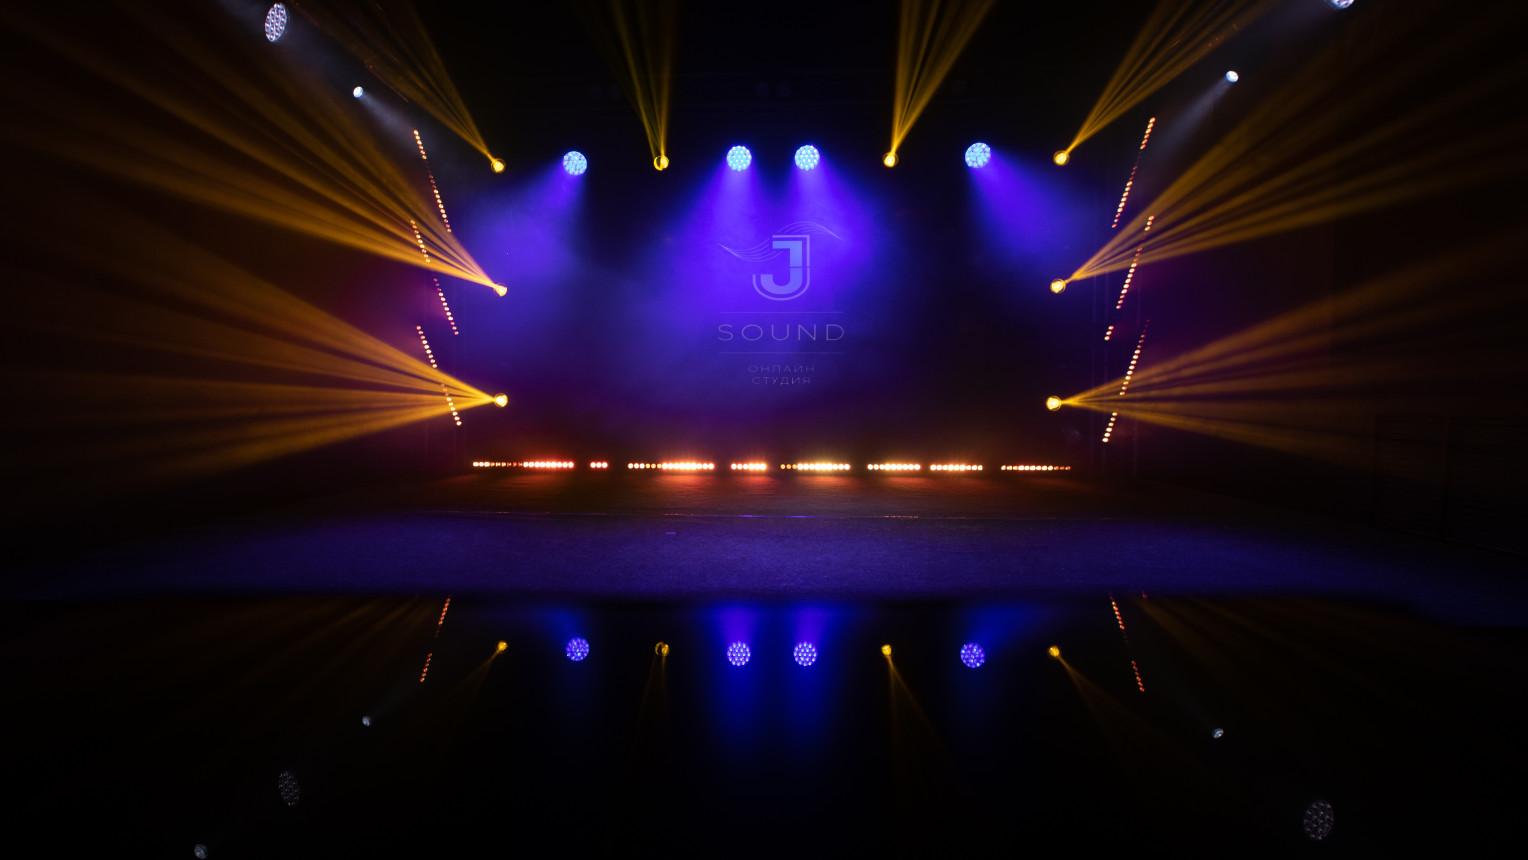 J-Sound концертный зал - фото №4